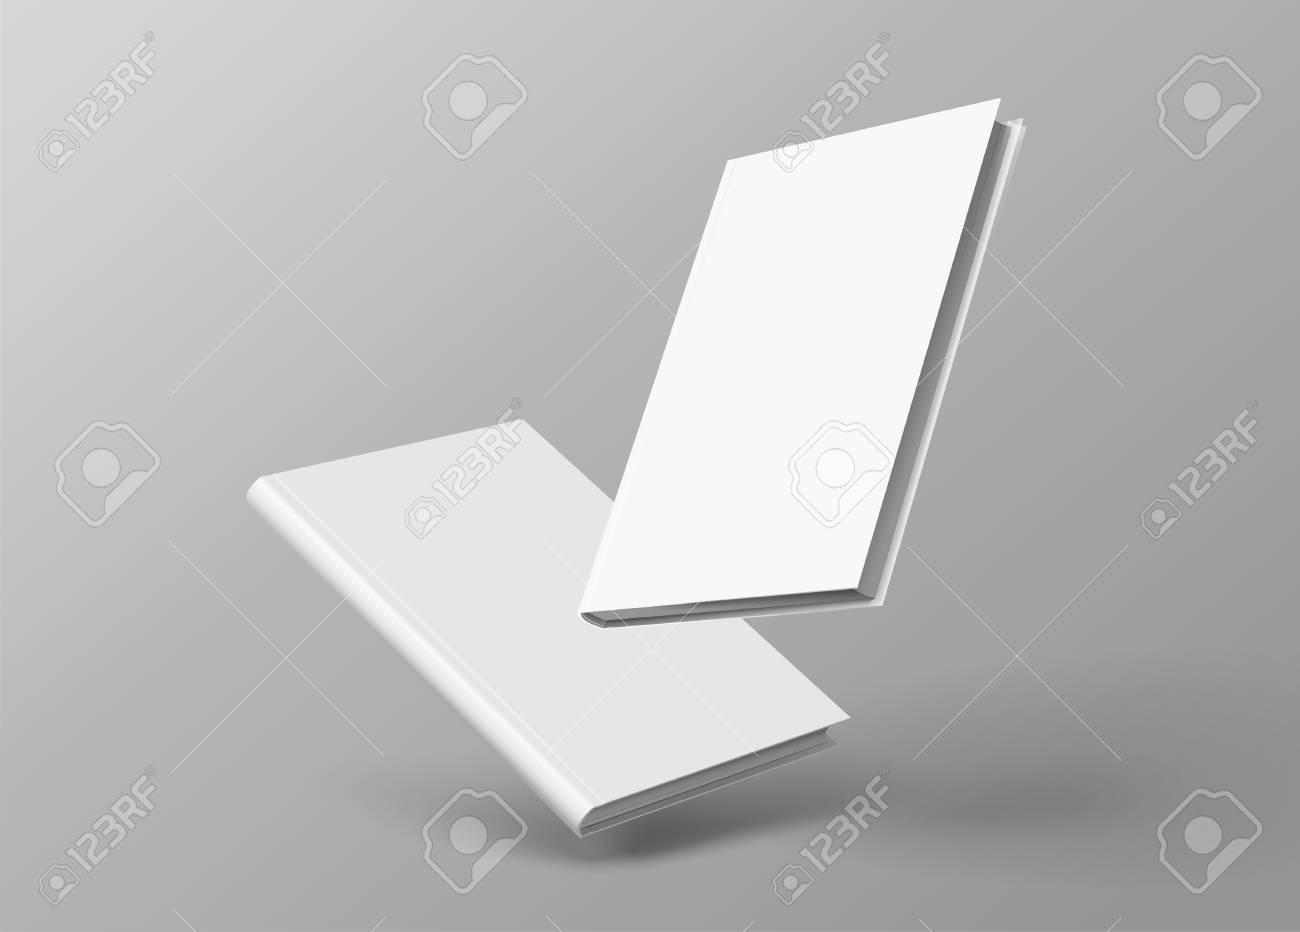 Hardcover books set floating on grey background in 3d illustration - 114831444